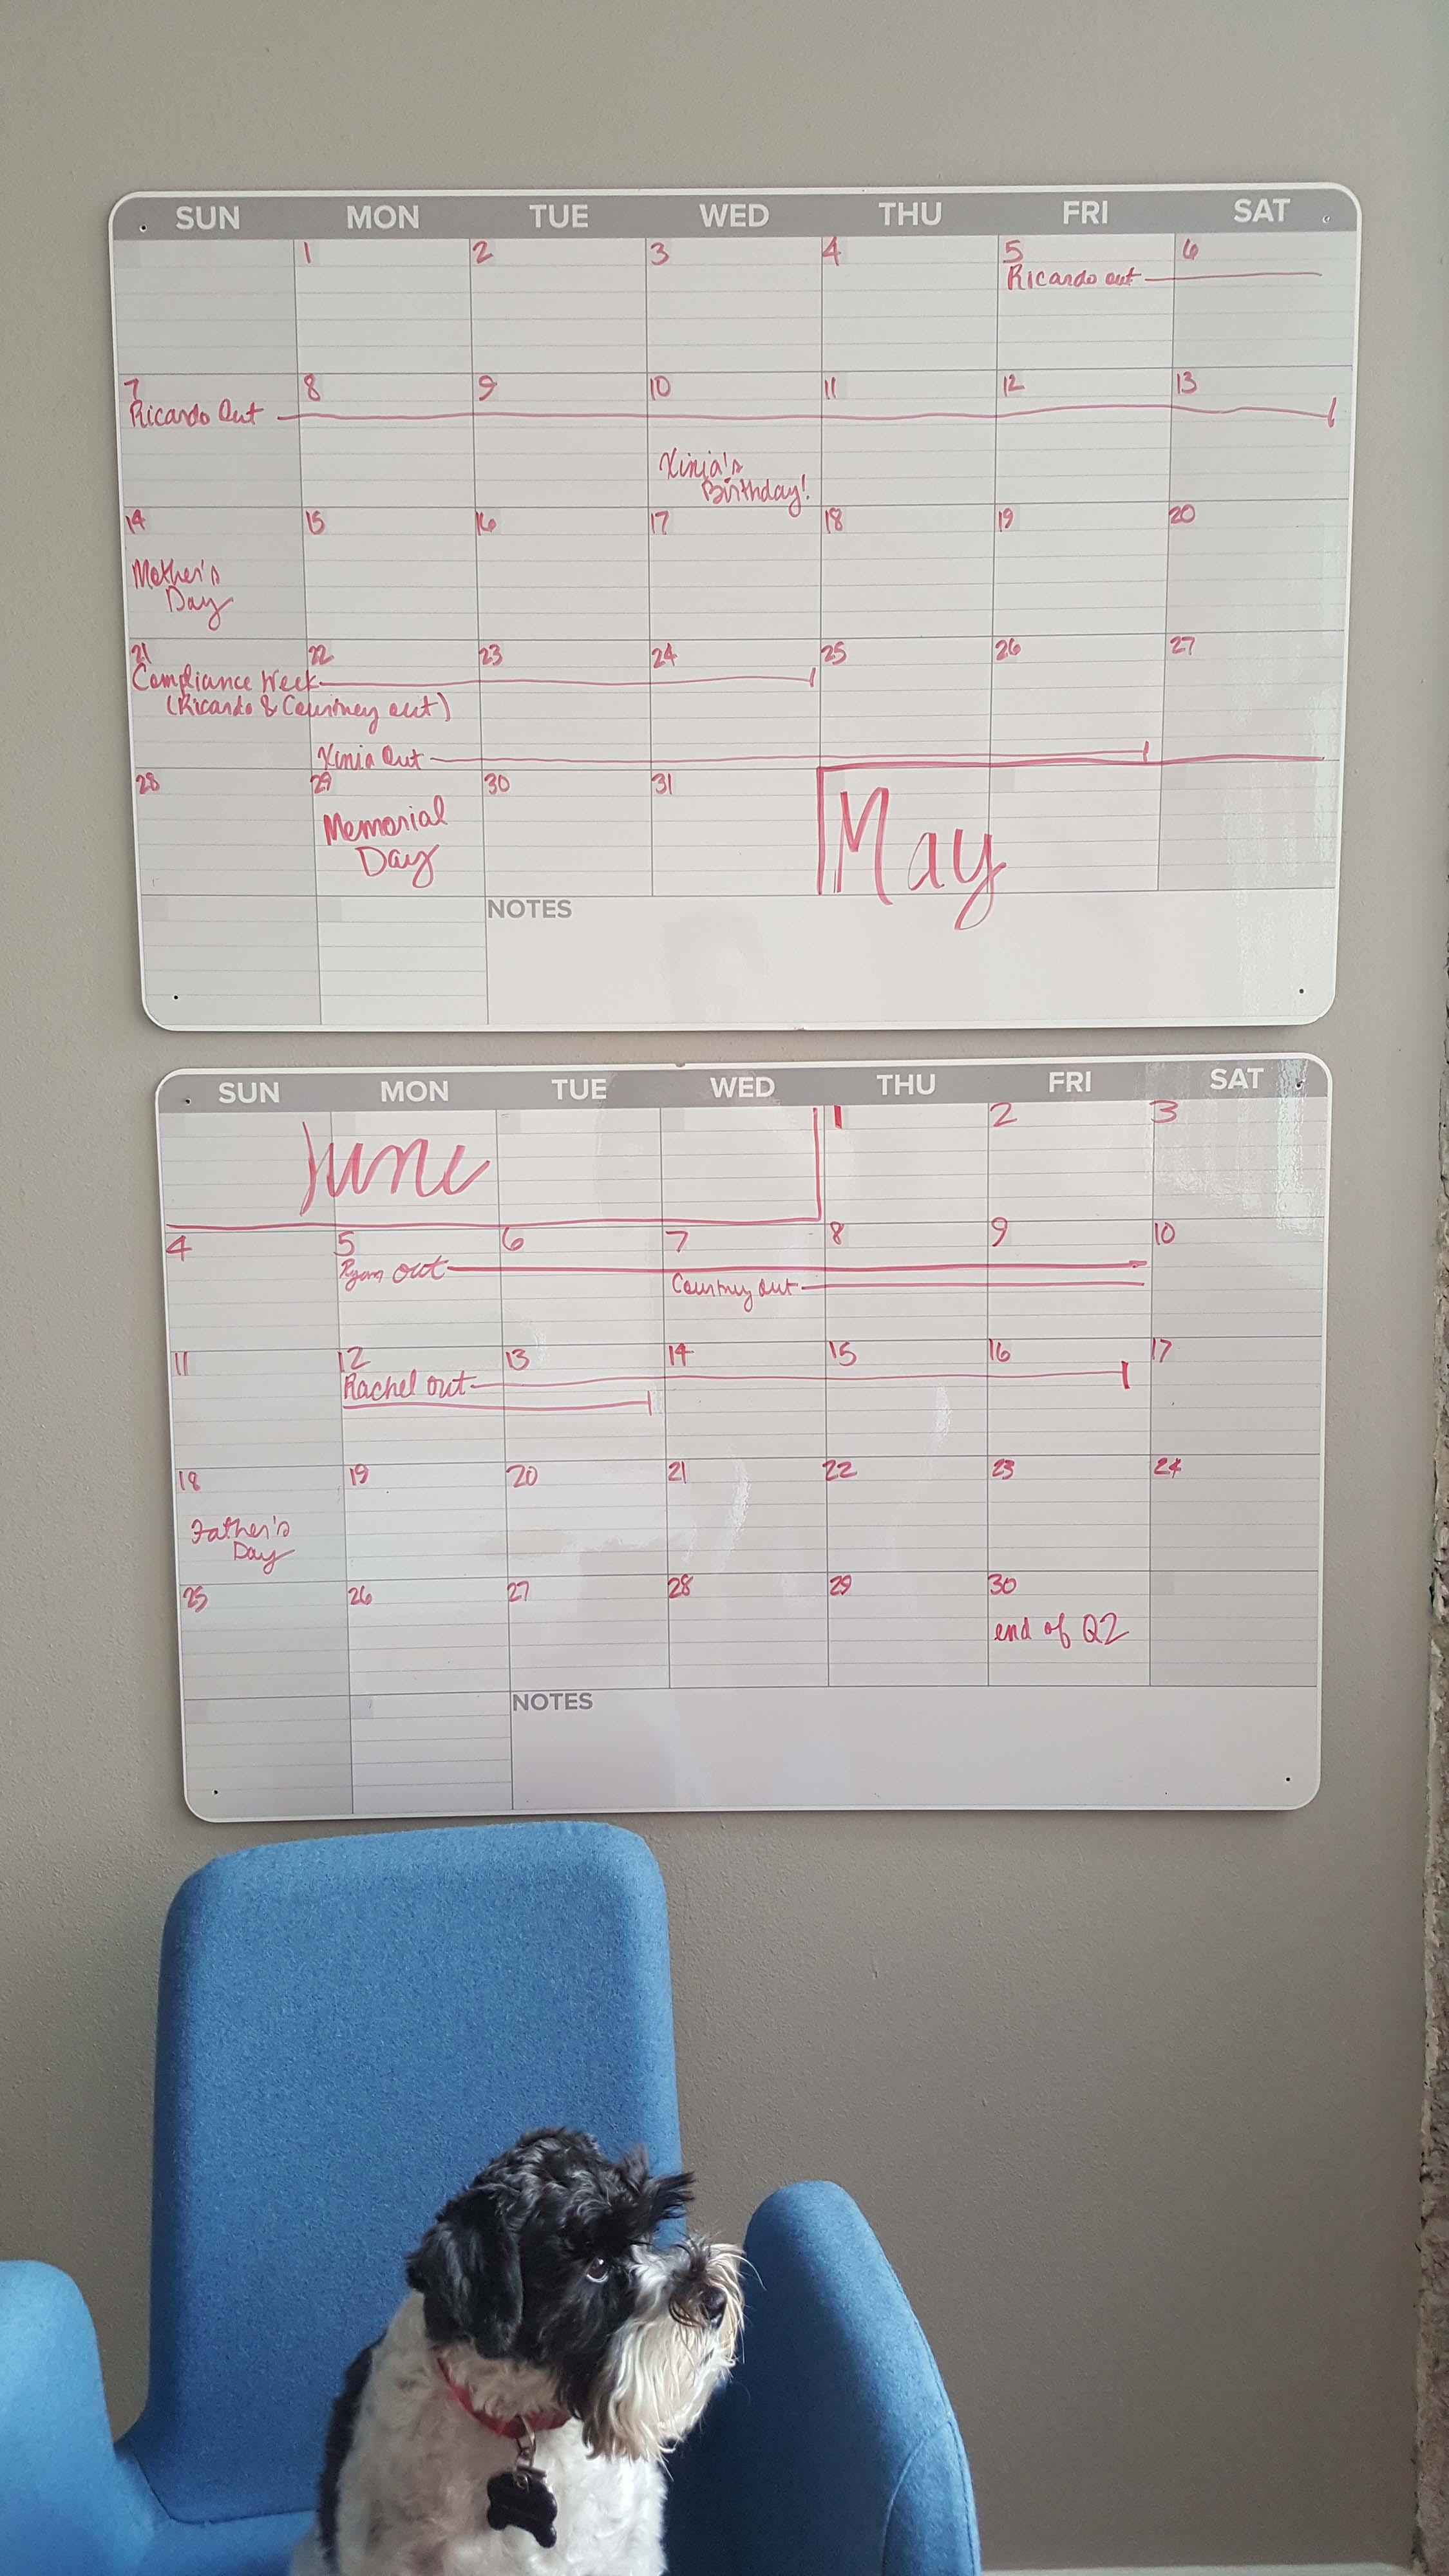 broadcat-vacation-calendar-plus-special-dog-appearance-1.jpg